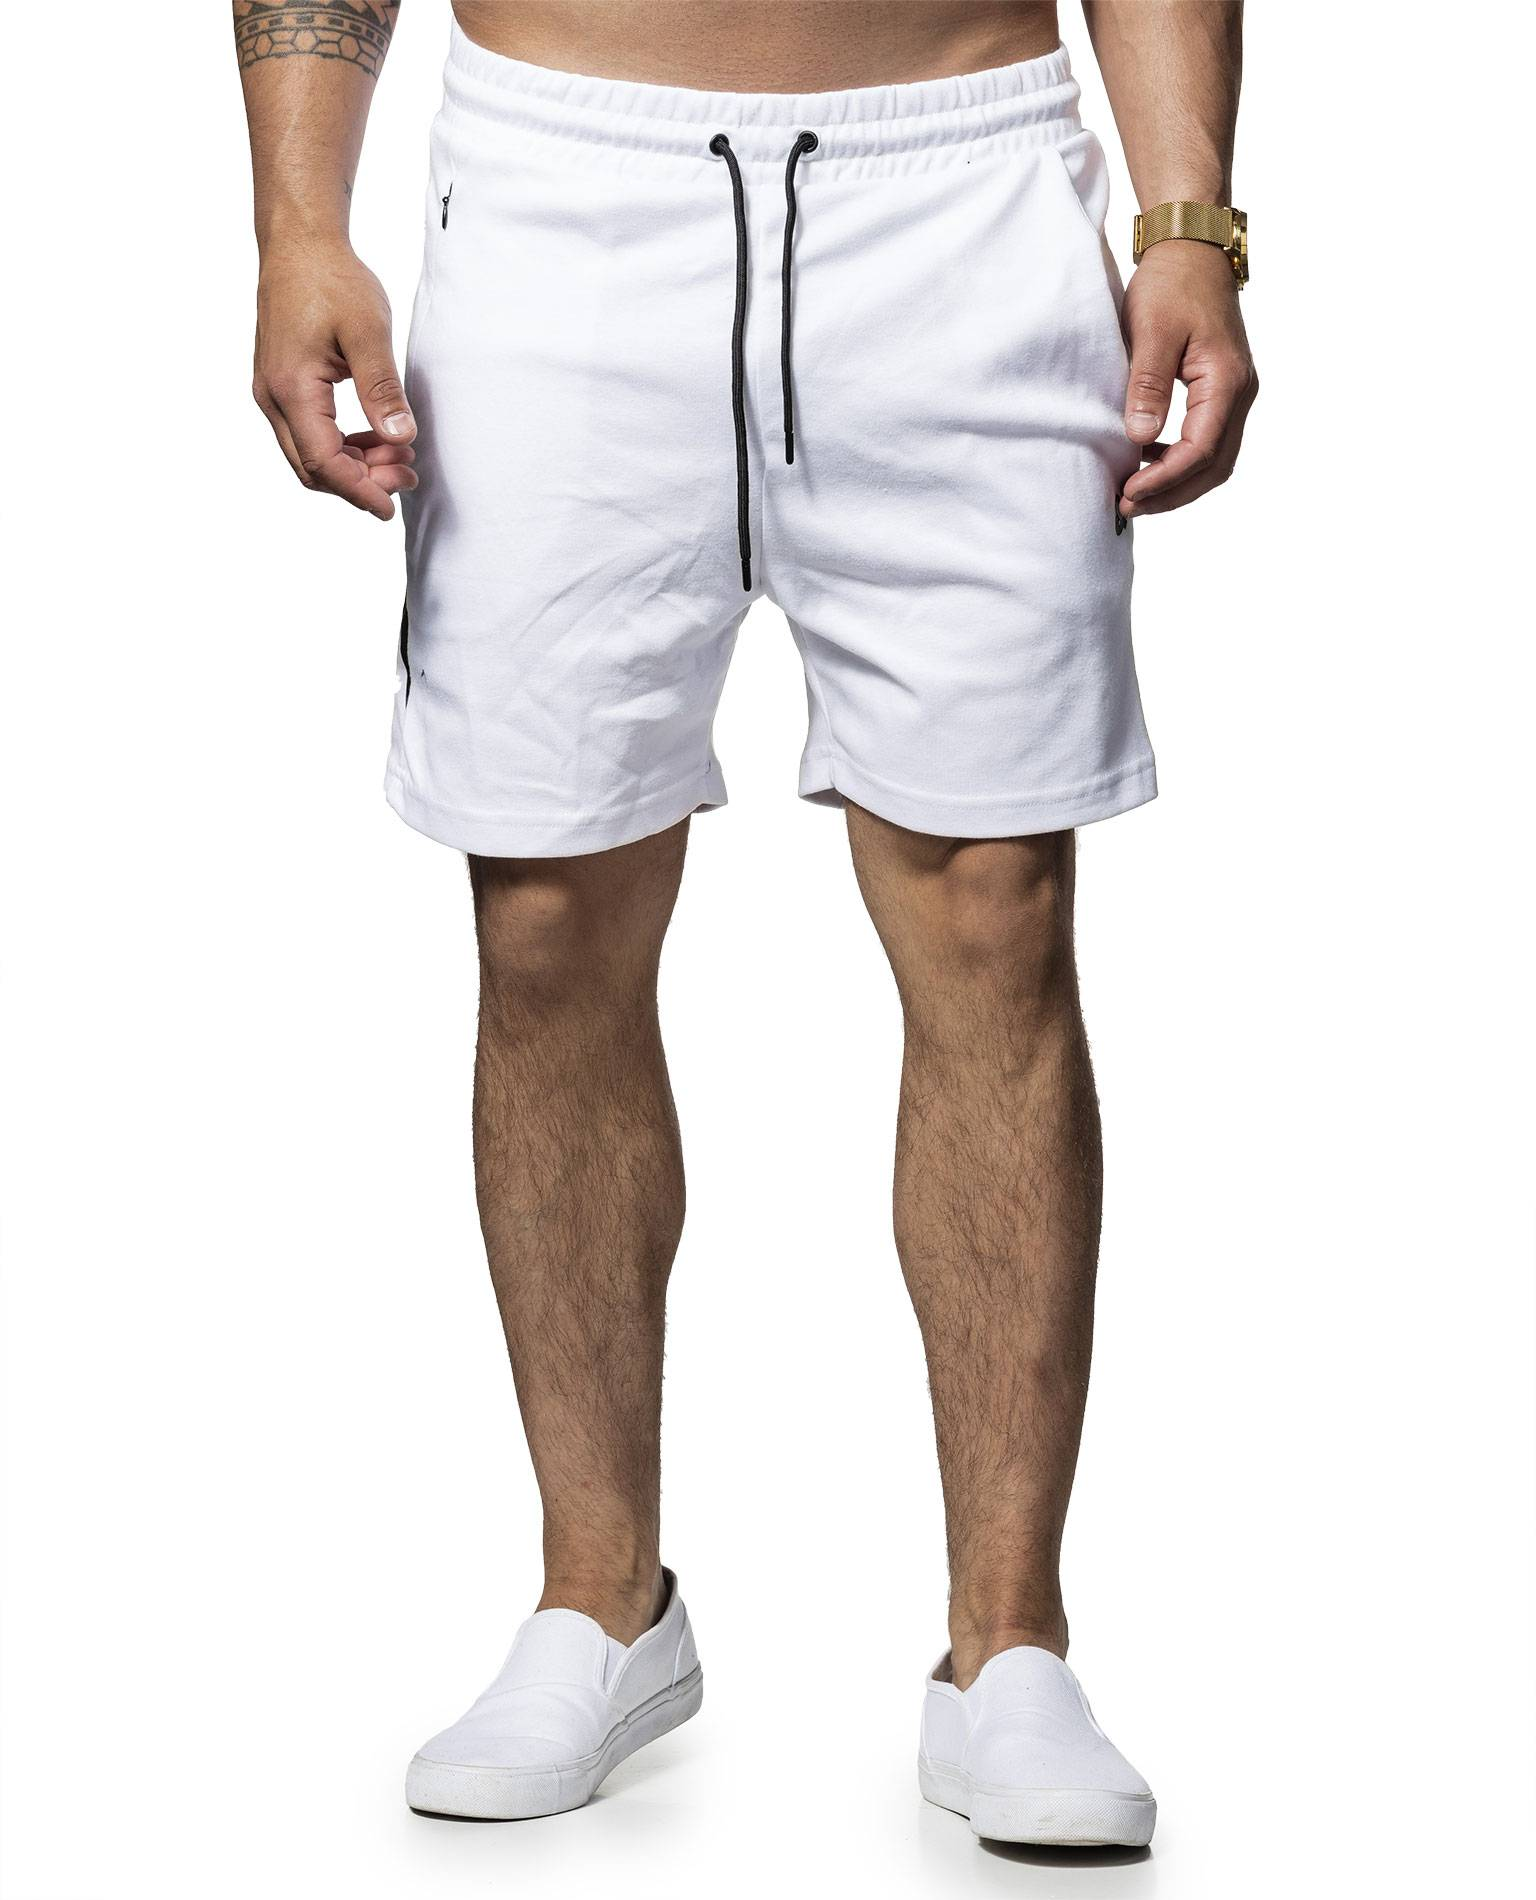 Clean Sweat Shorts White Jack & Jones